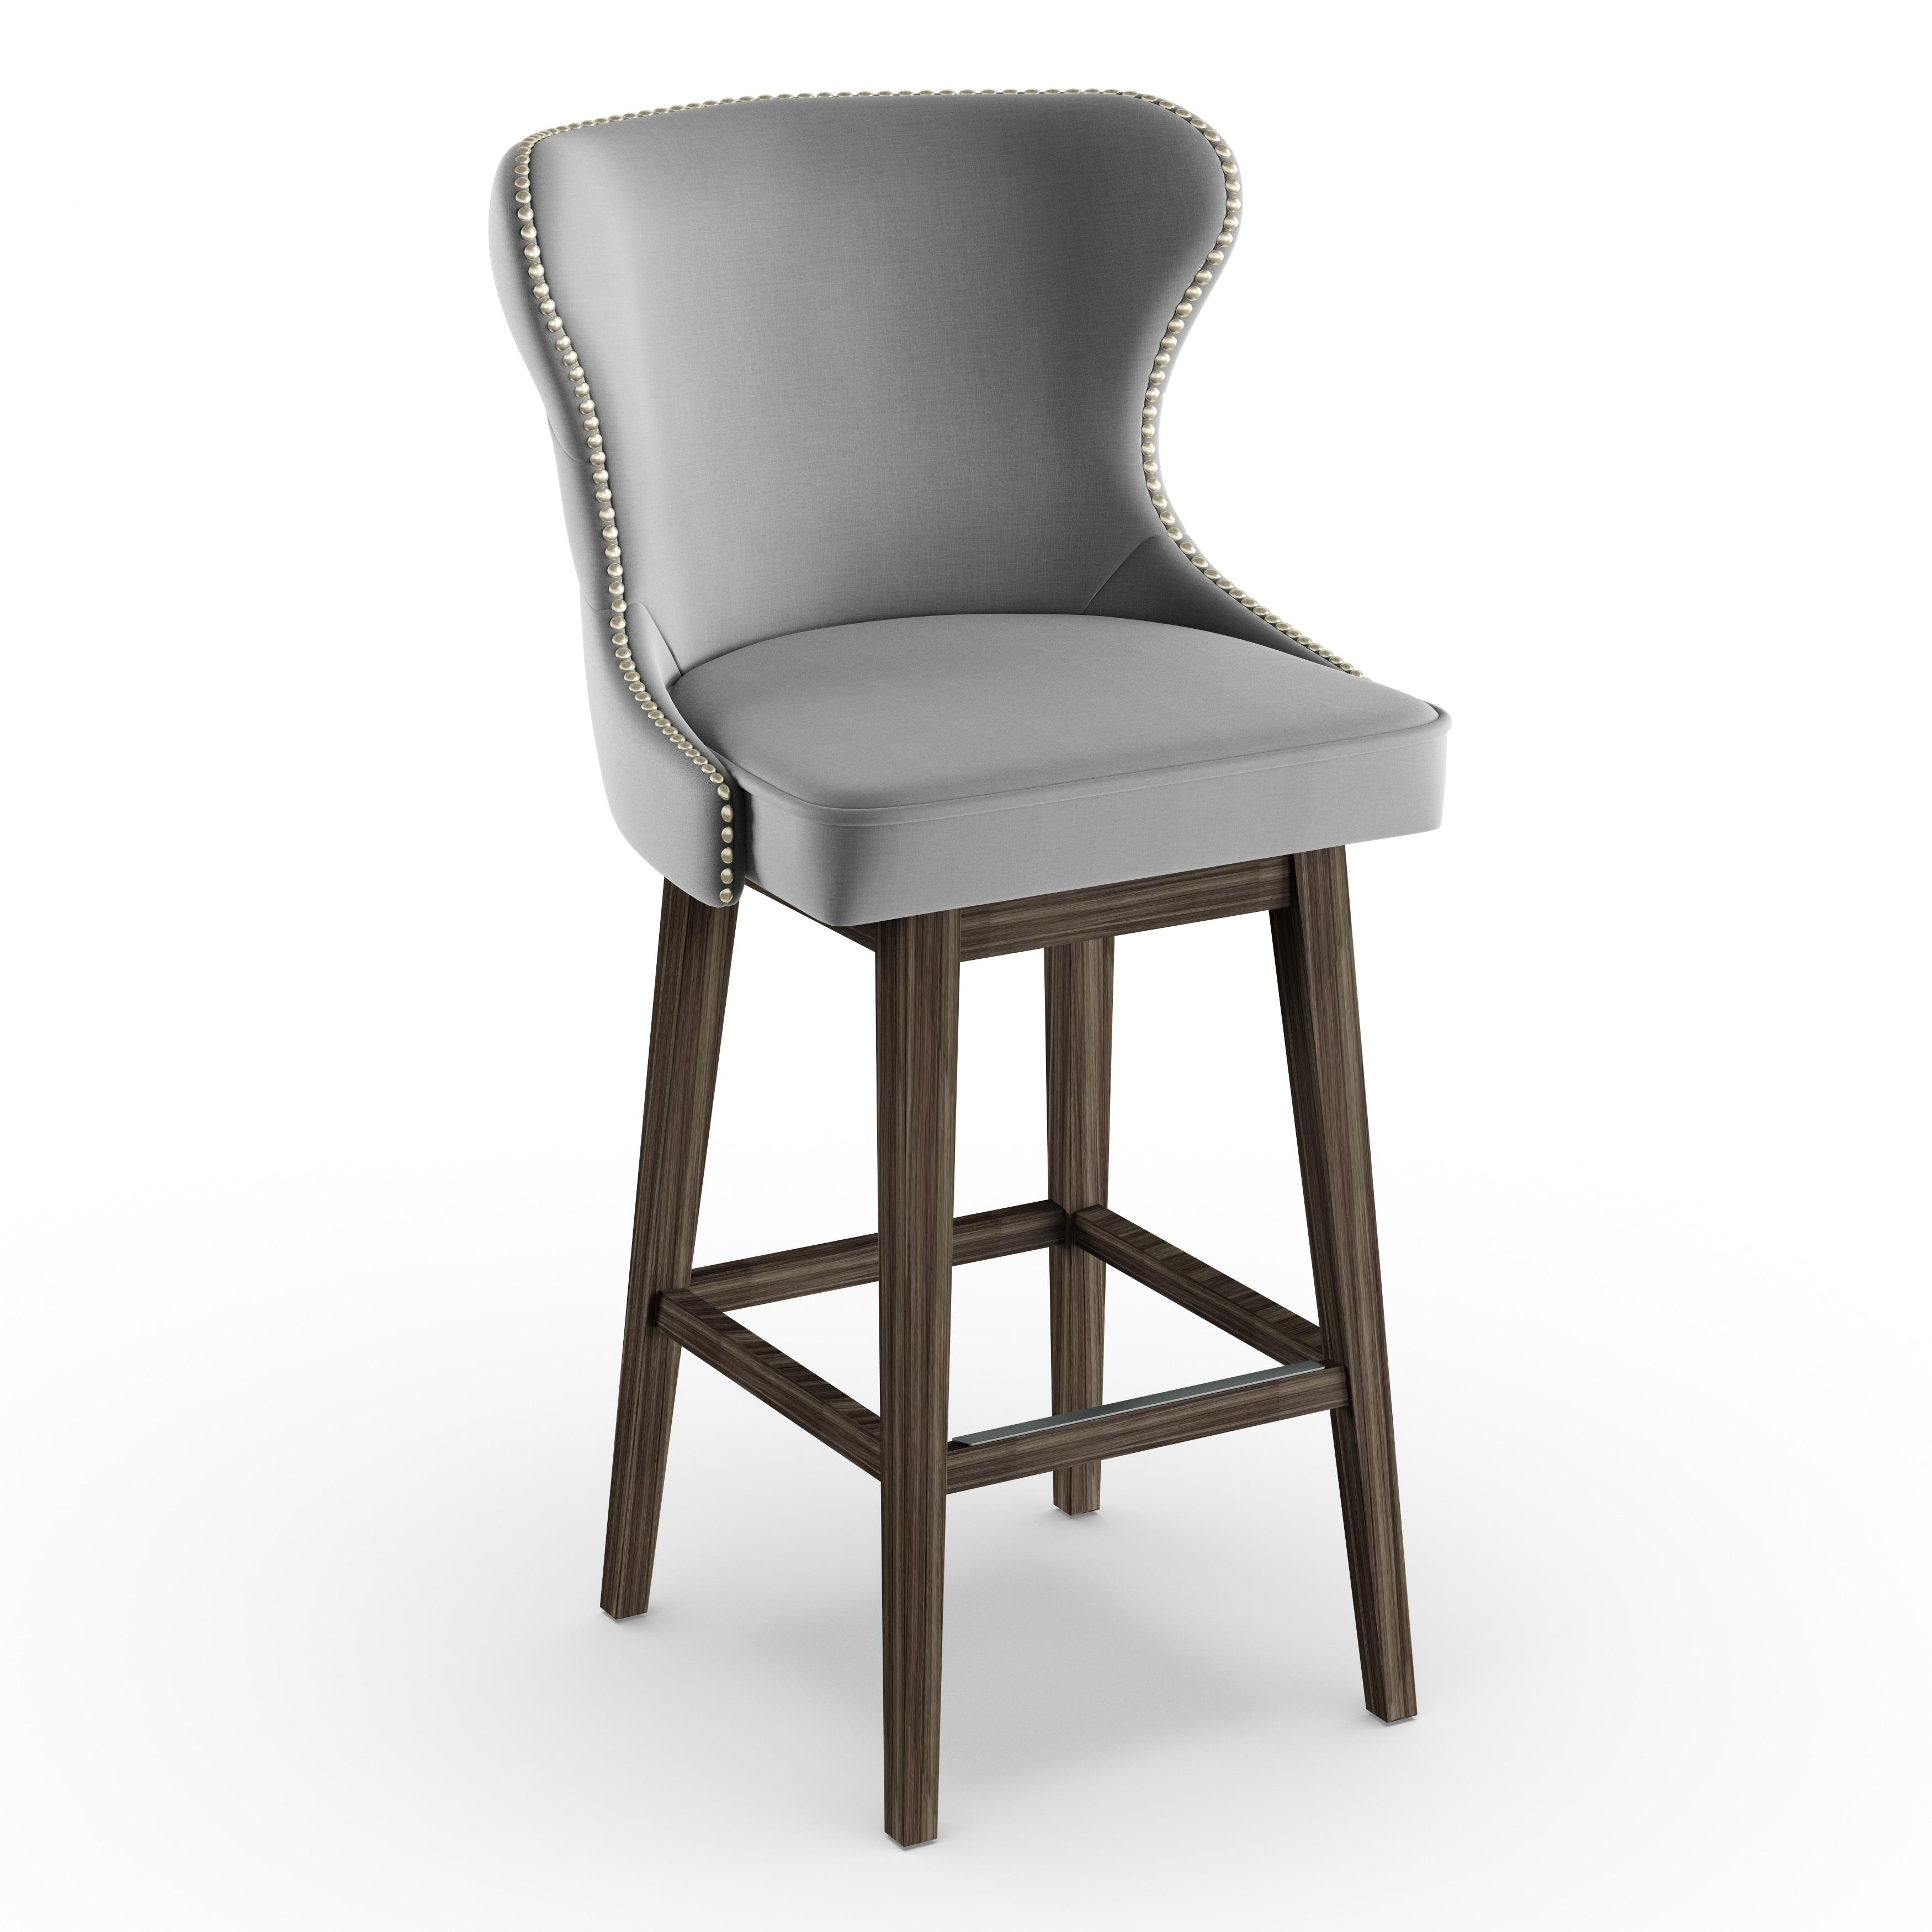 Strange Gracewood Hollow Paul Dark Grey 30 Inch Barstool Inzonedesignstudio Interior Chair Design Inzonedesignstudiocom